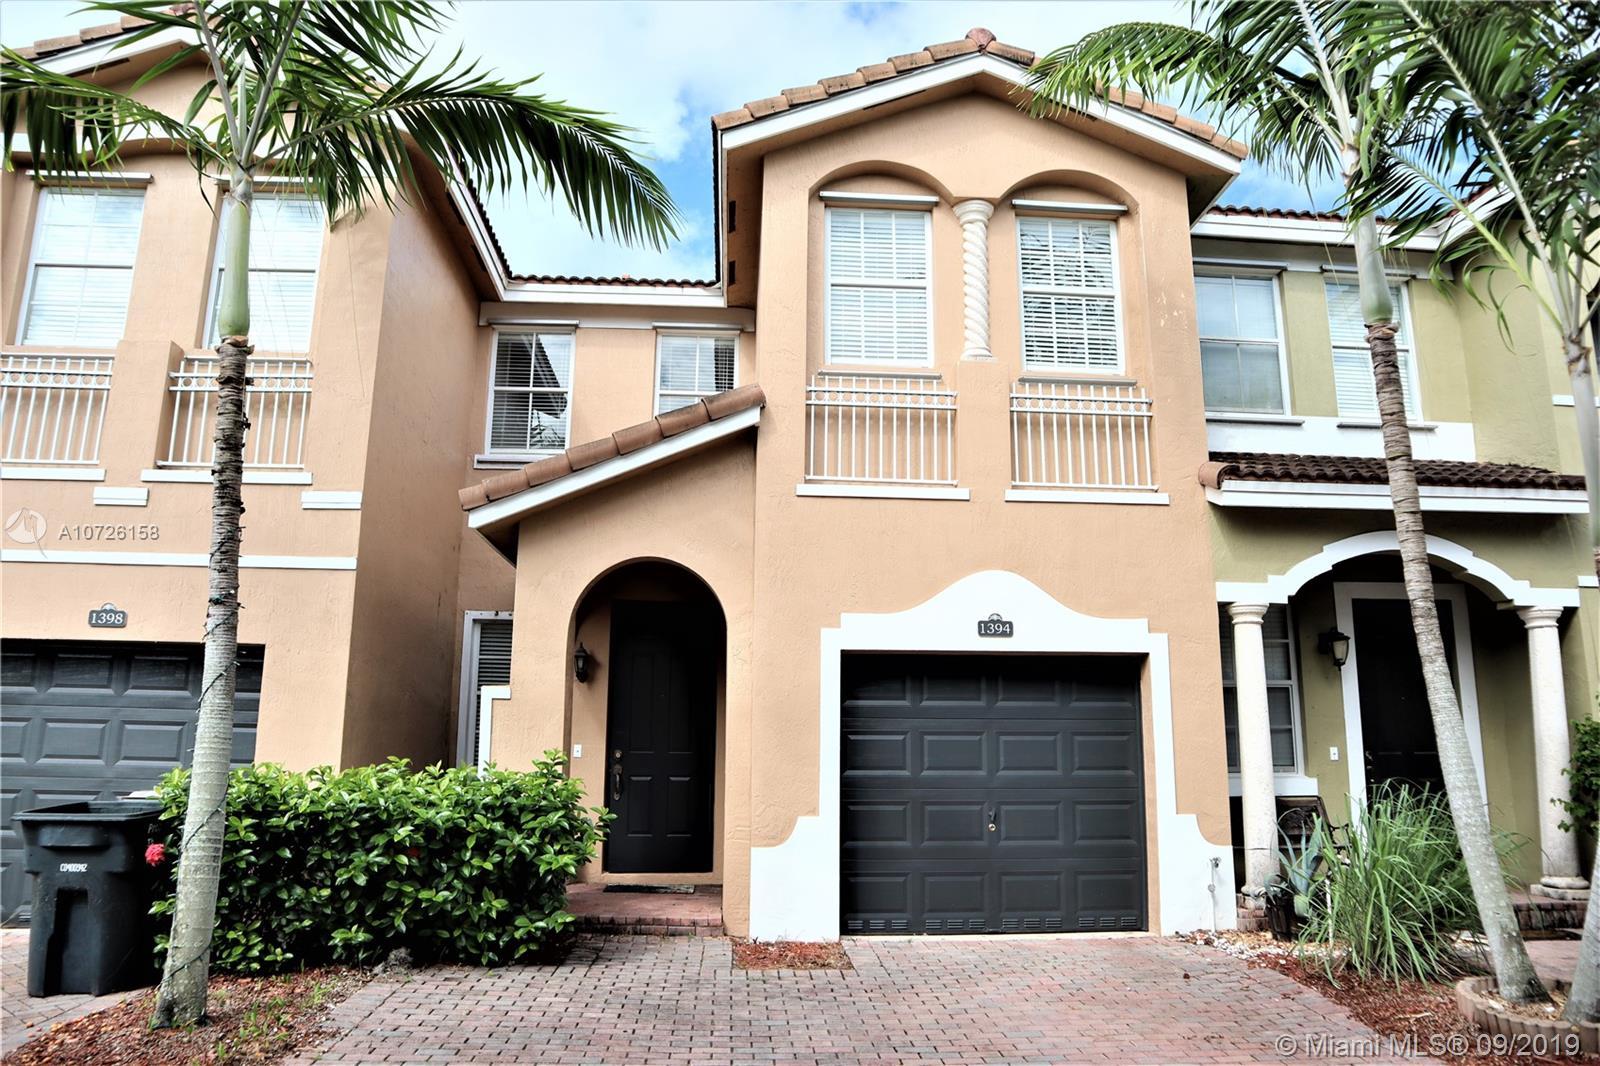 1394 26th Ave, Homestead, FL 33035 - Homestead, FL real estate listing